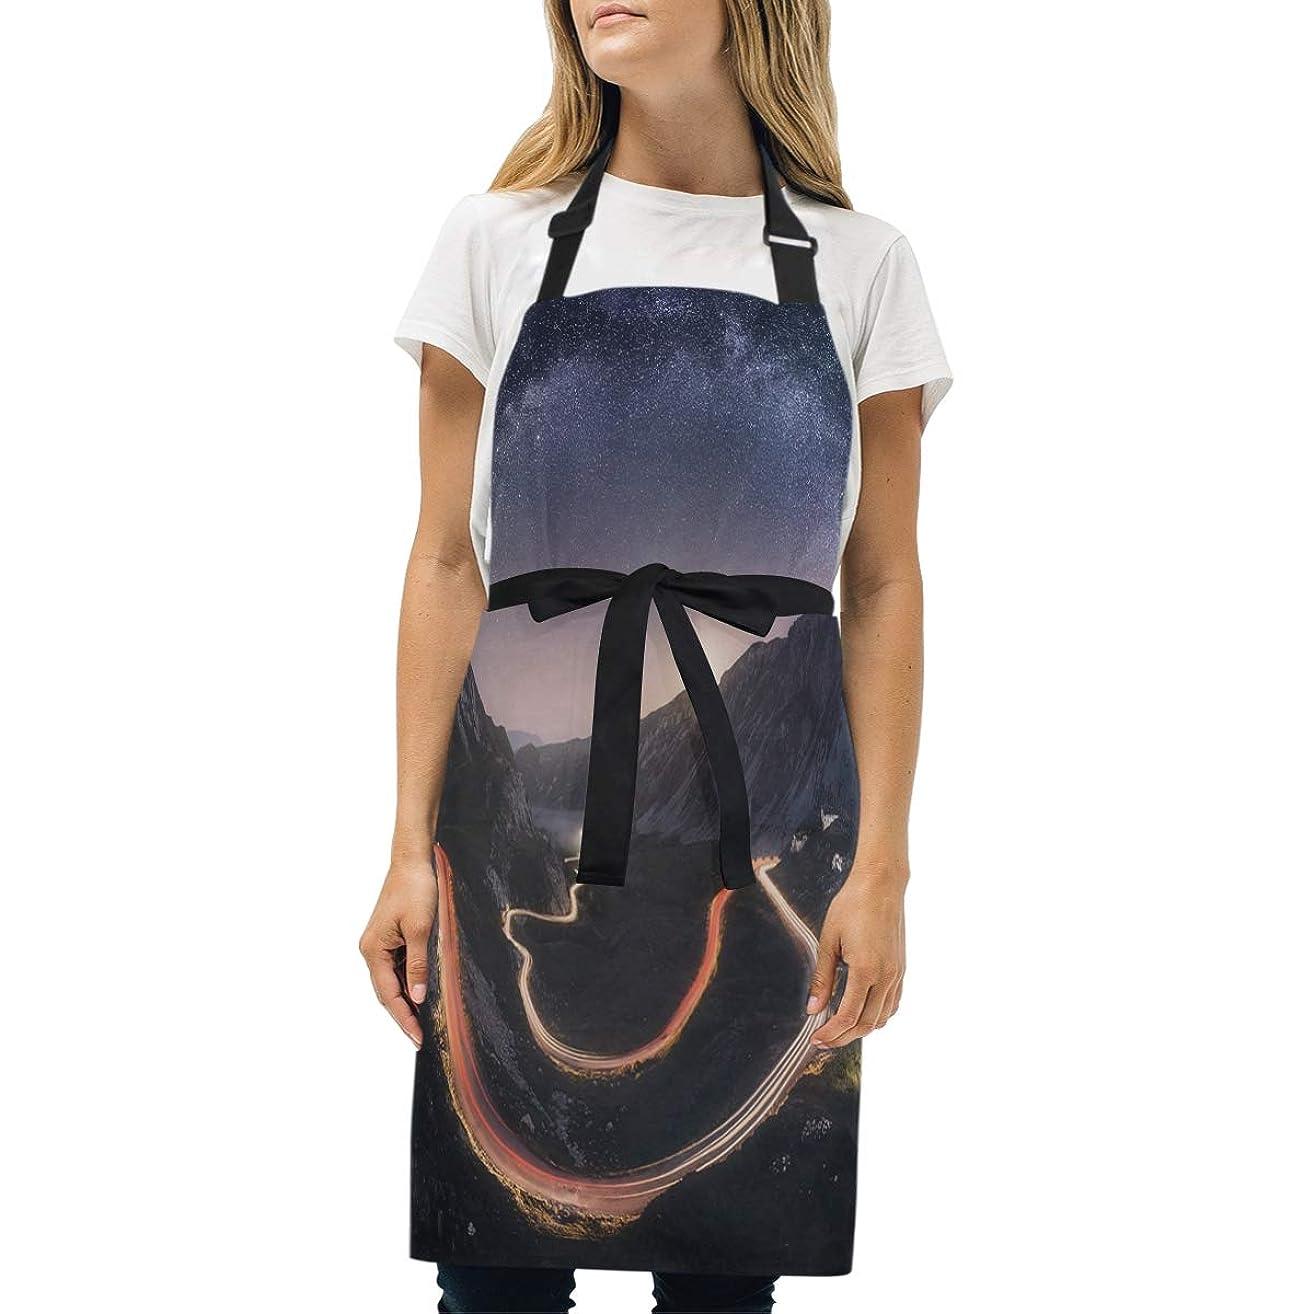 HJudge Womens Aprons Landscape Lights Italy Kitchen Bib Aprons with Pockets Adjustable Buckle on Neck